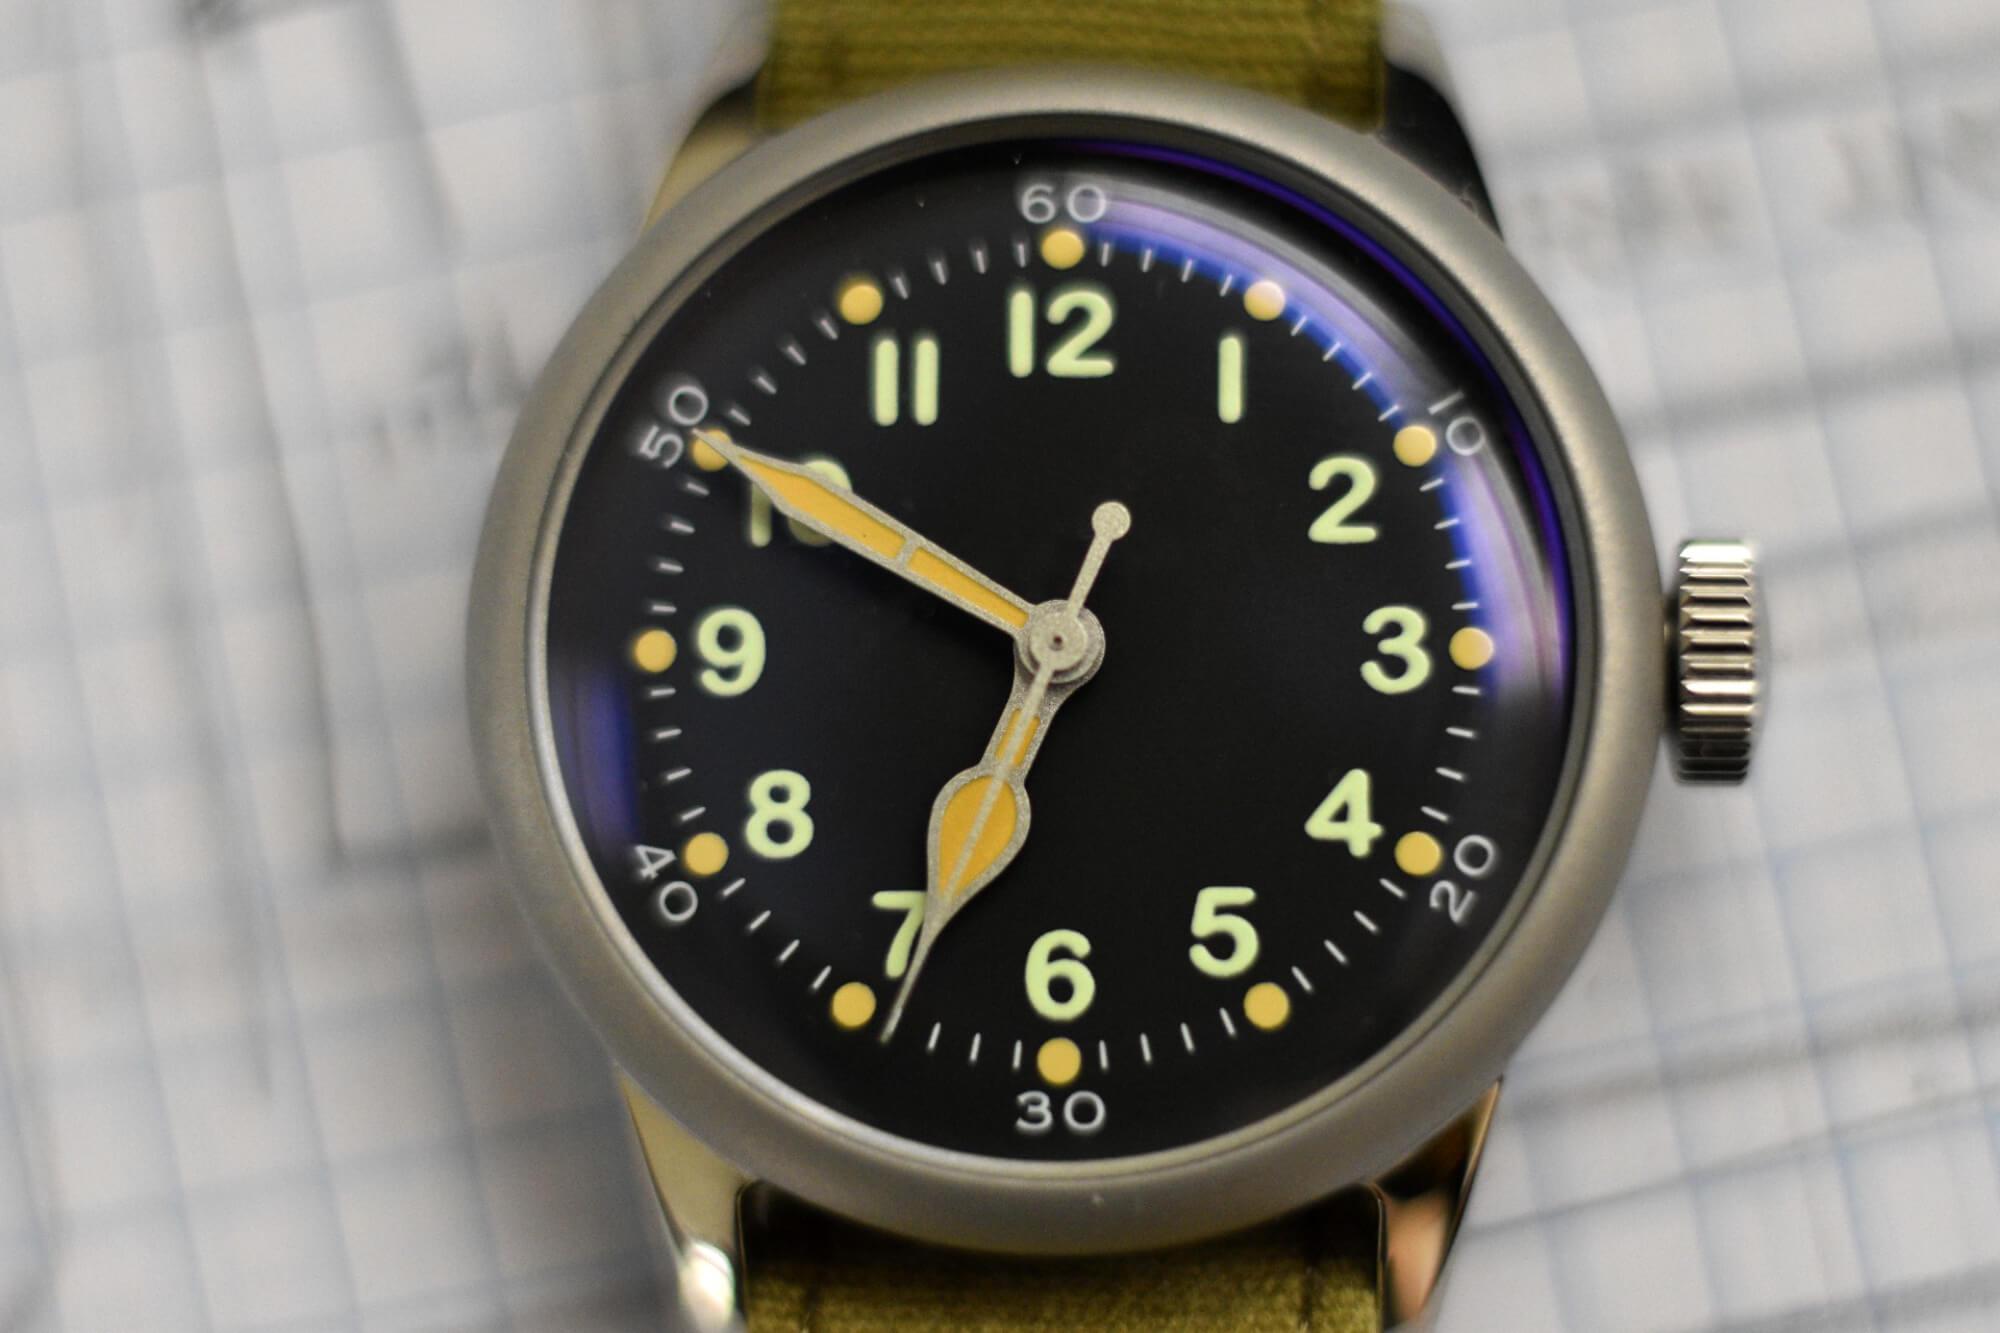 Praesidus-A-11-Closeup-field-watch